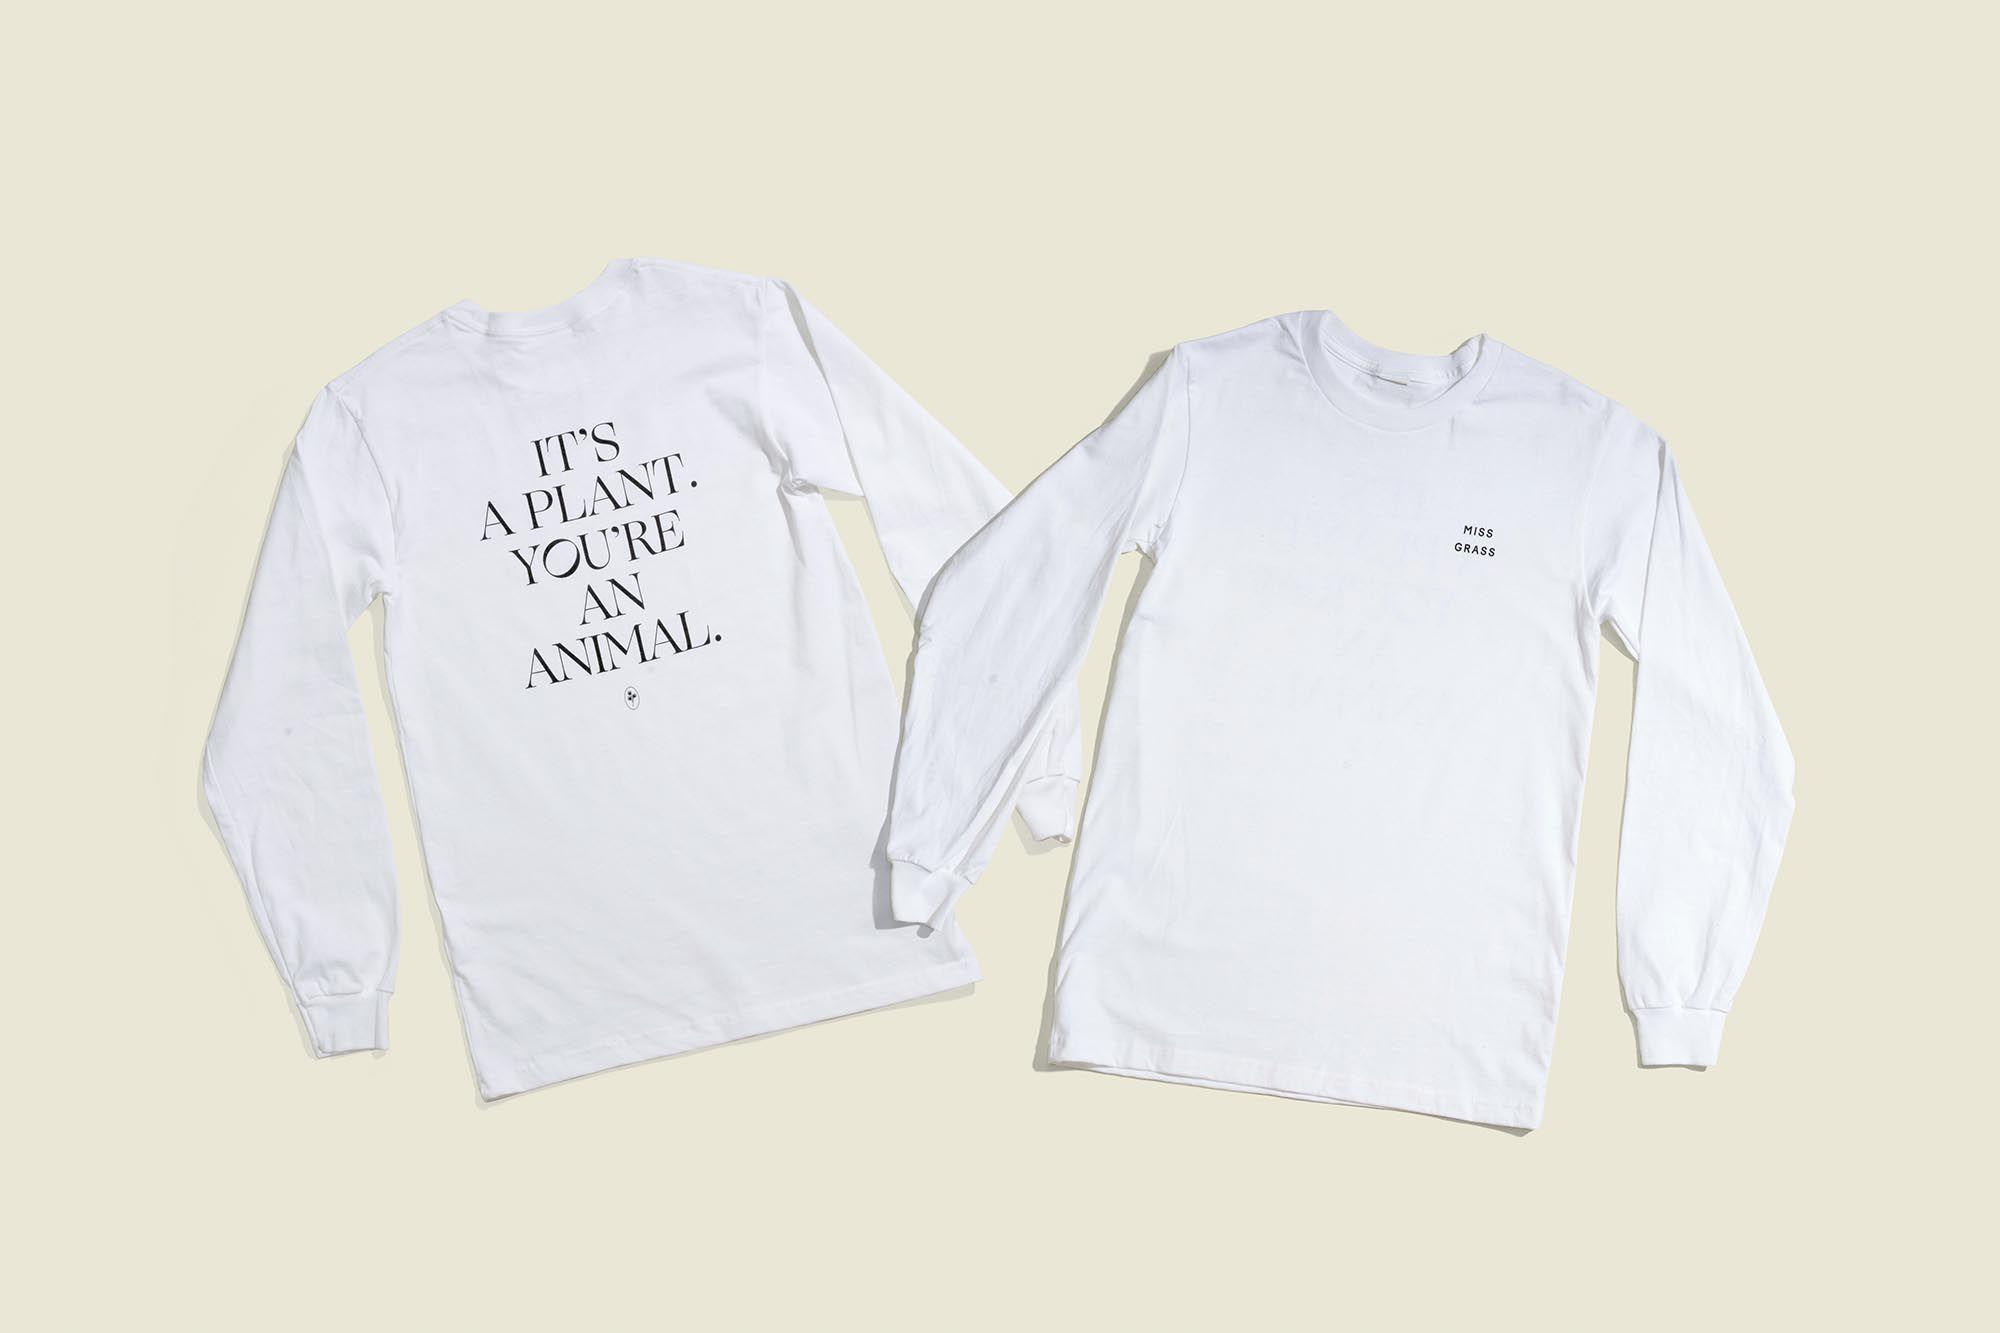 Long sleeved t-shirts